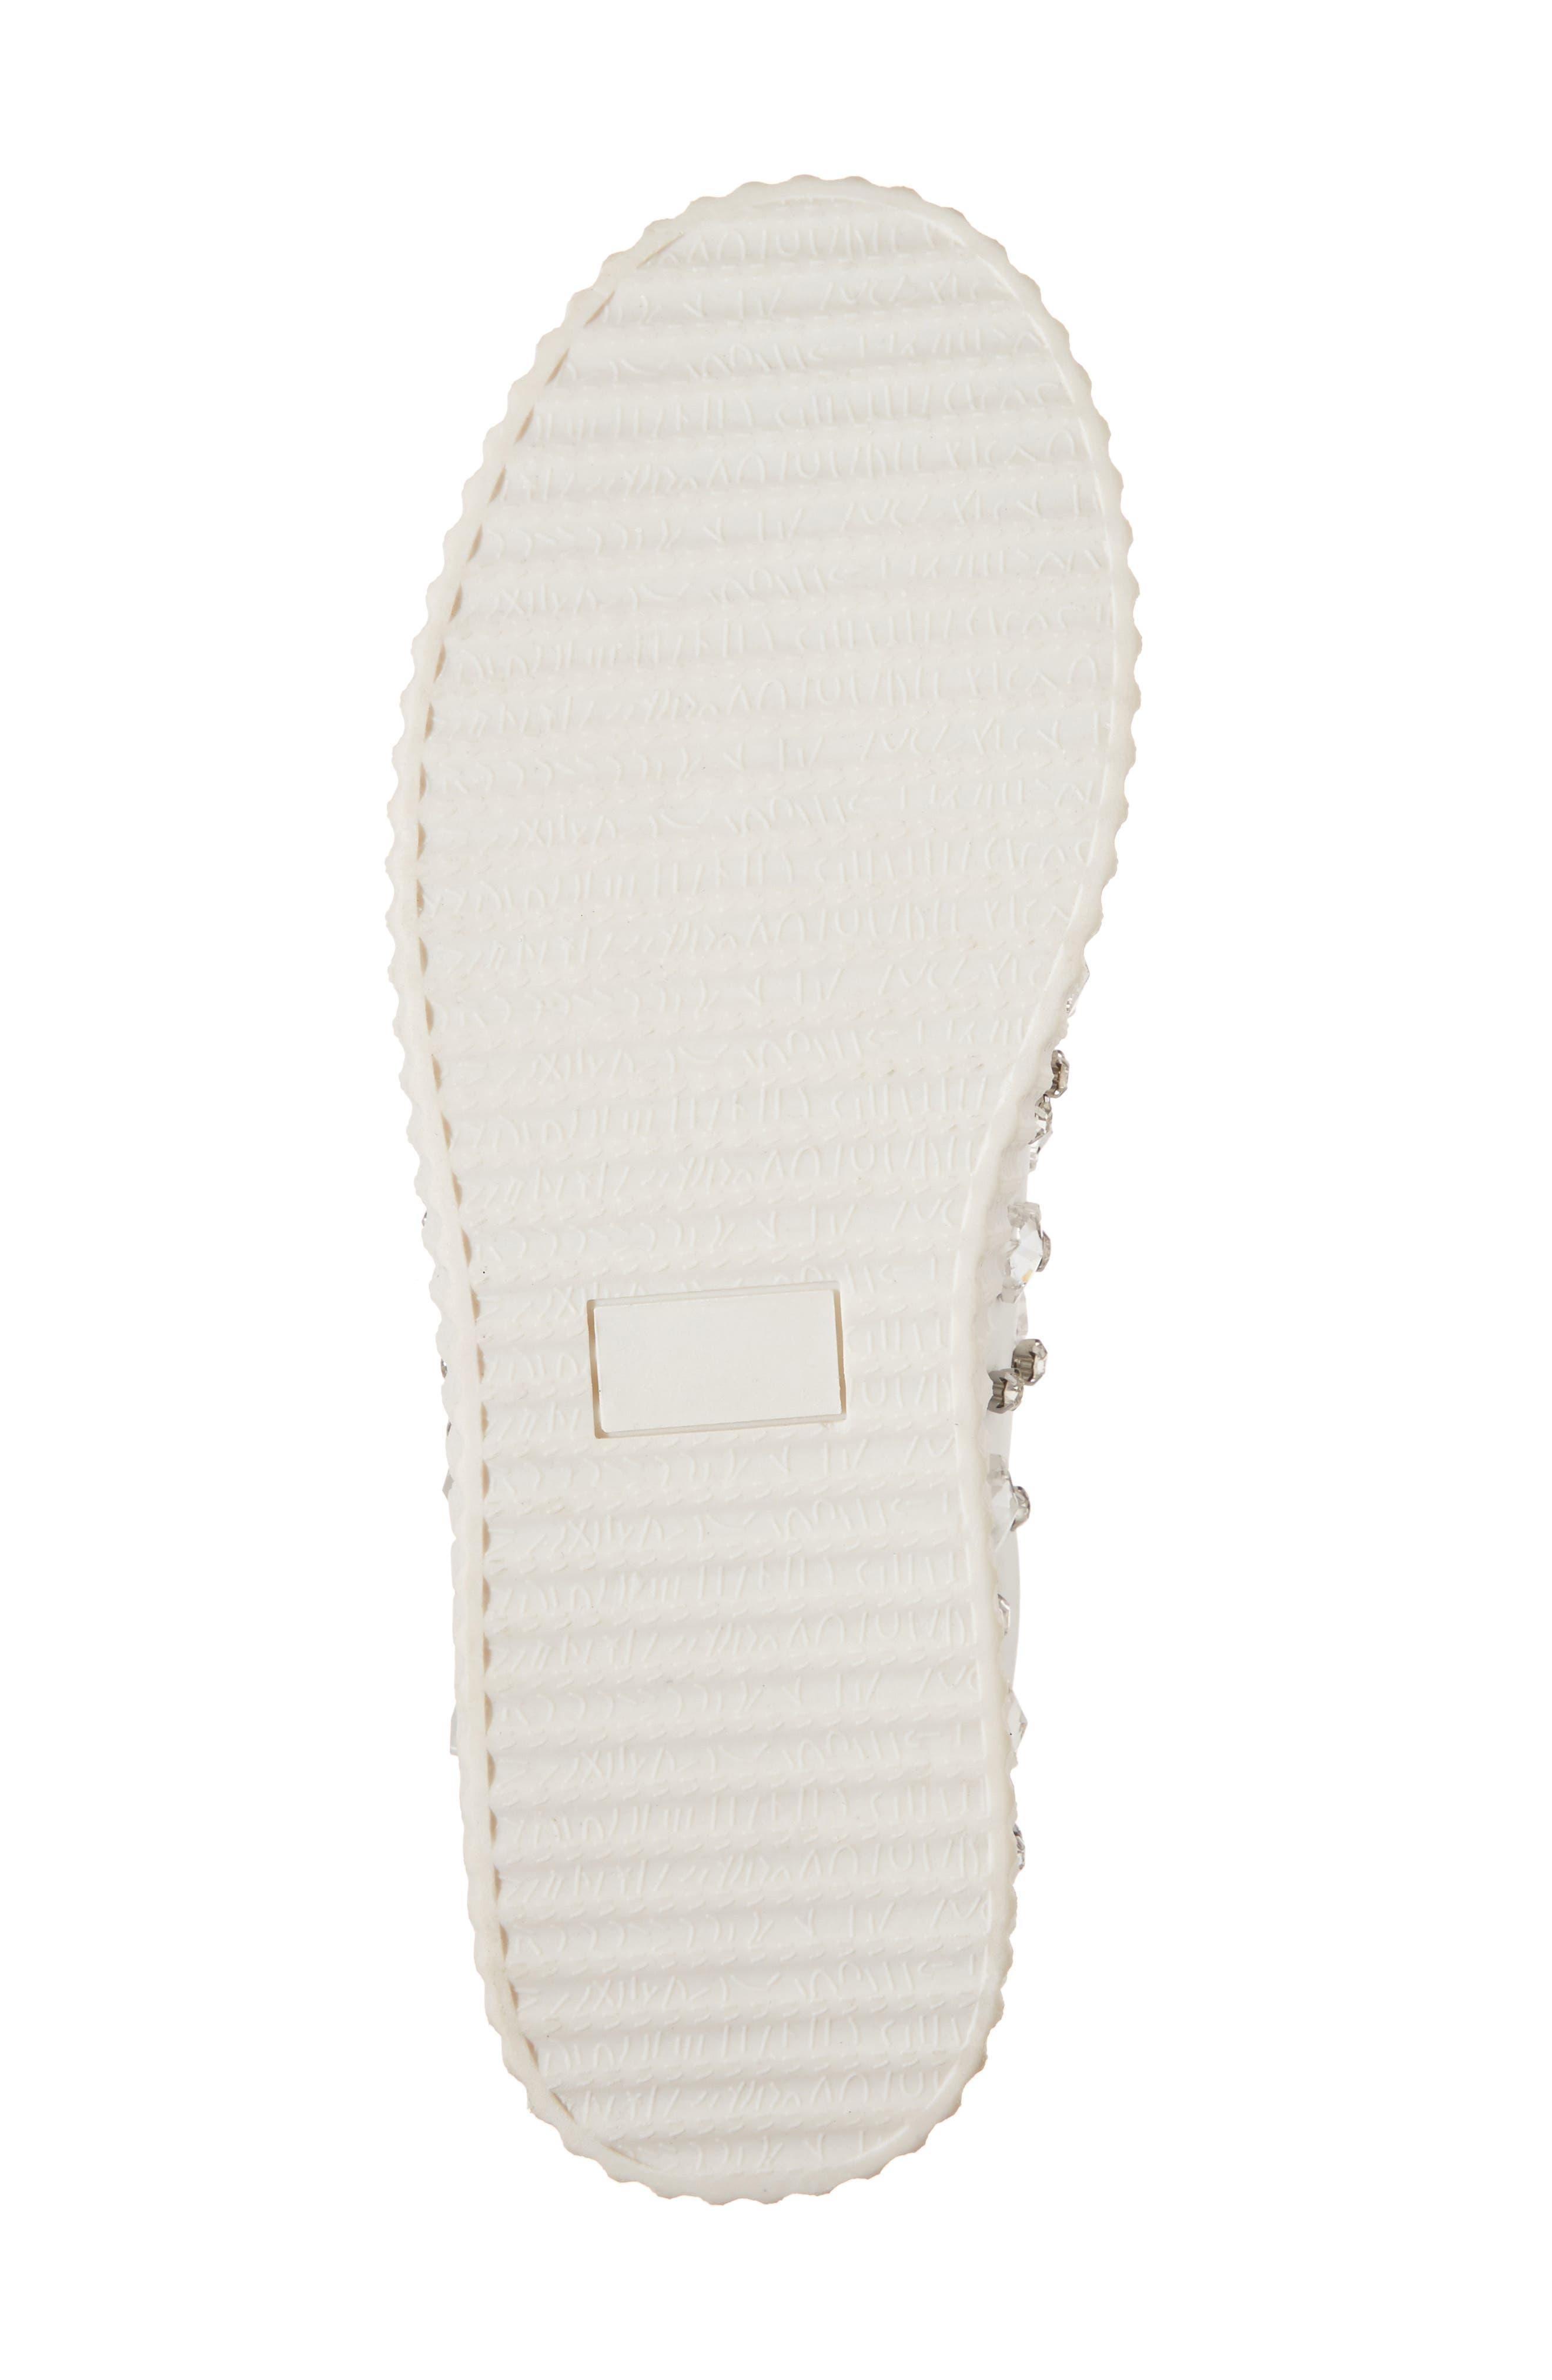 Pam Embellished Platform Sneaker,                             Alternate thumbnail 6, color,                             White